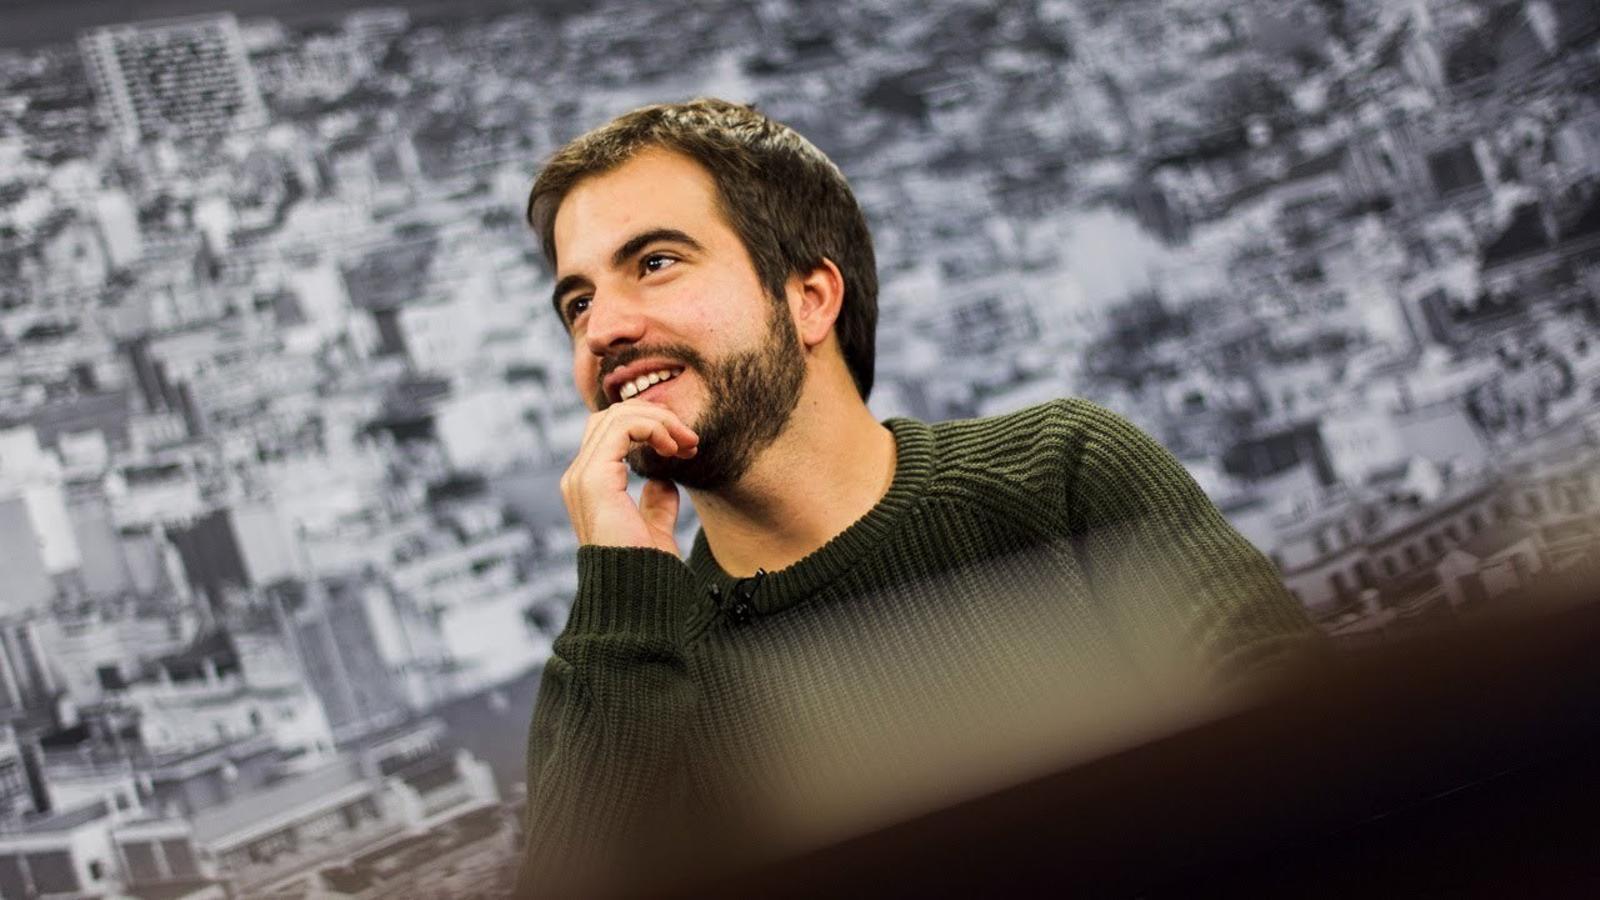 Entrevista d'Antoni Bassas a Ricard Ustrell